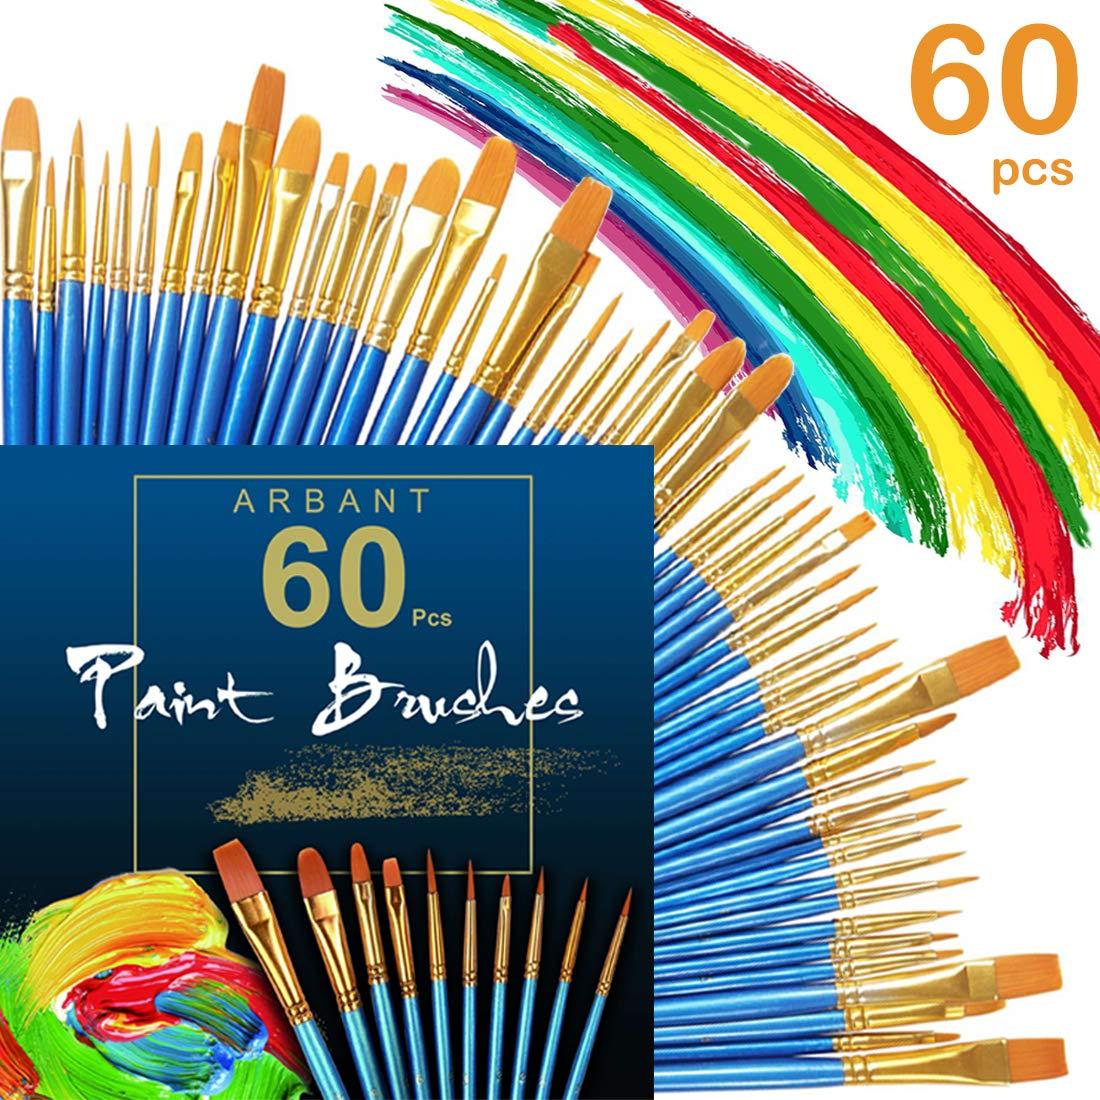 Paint Brushes Set,60 Pcs Nylon Hair Brushes Sets for Fine Detailing & Art Painting, Acrylic Watercolor Oil, Nail Art, Miniature Painting ARBANT